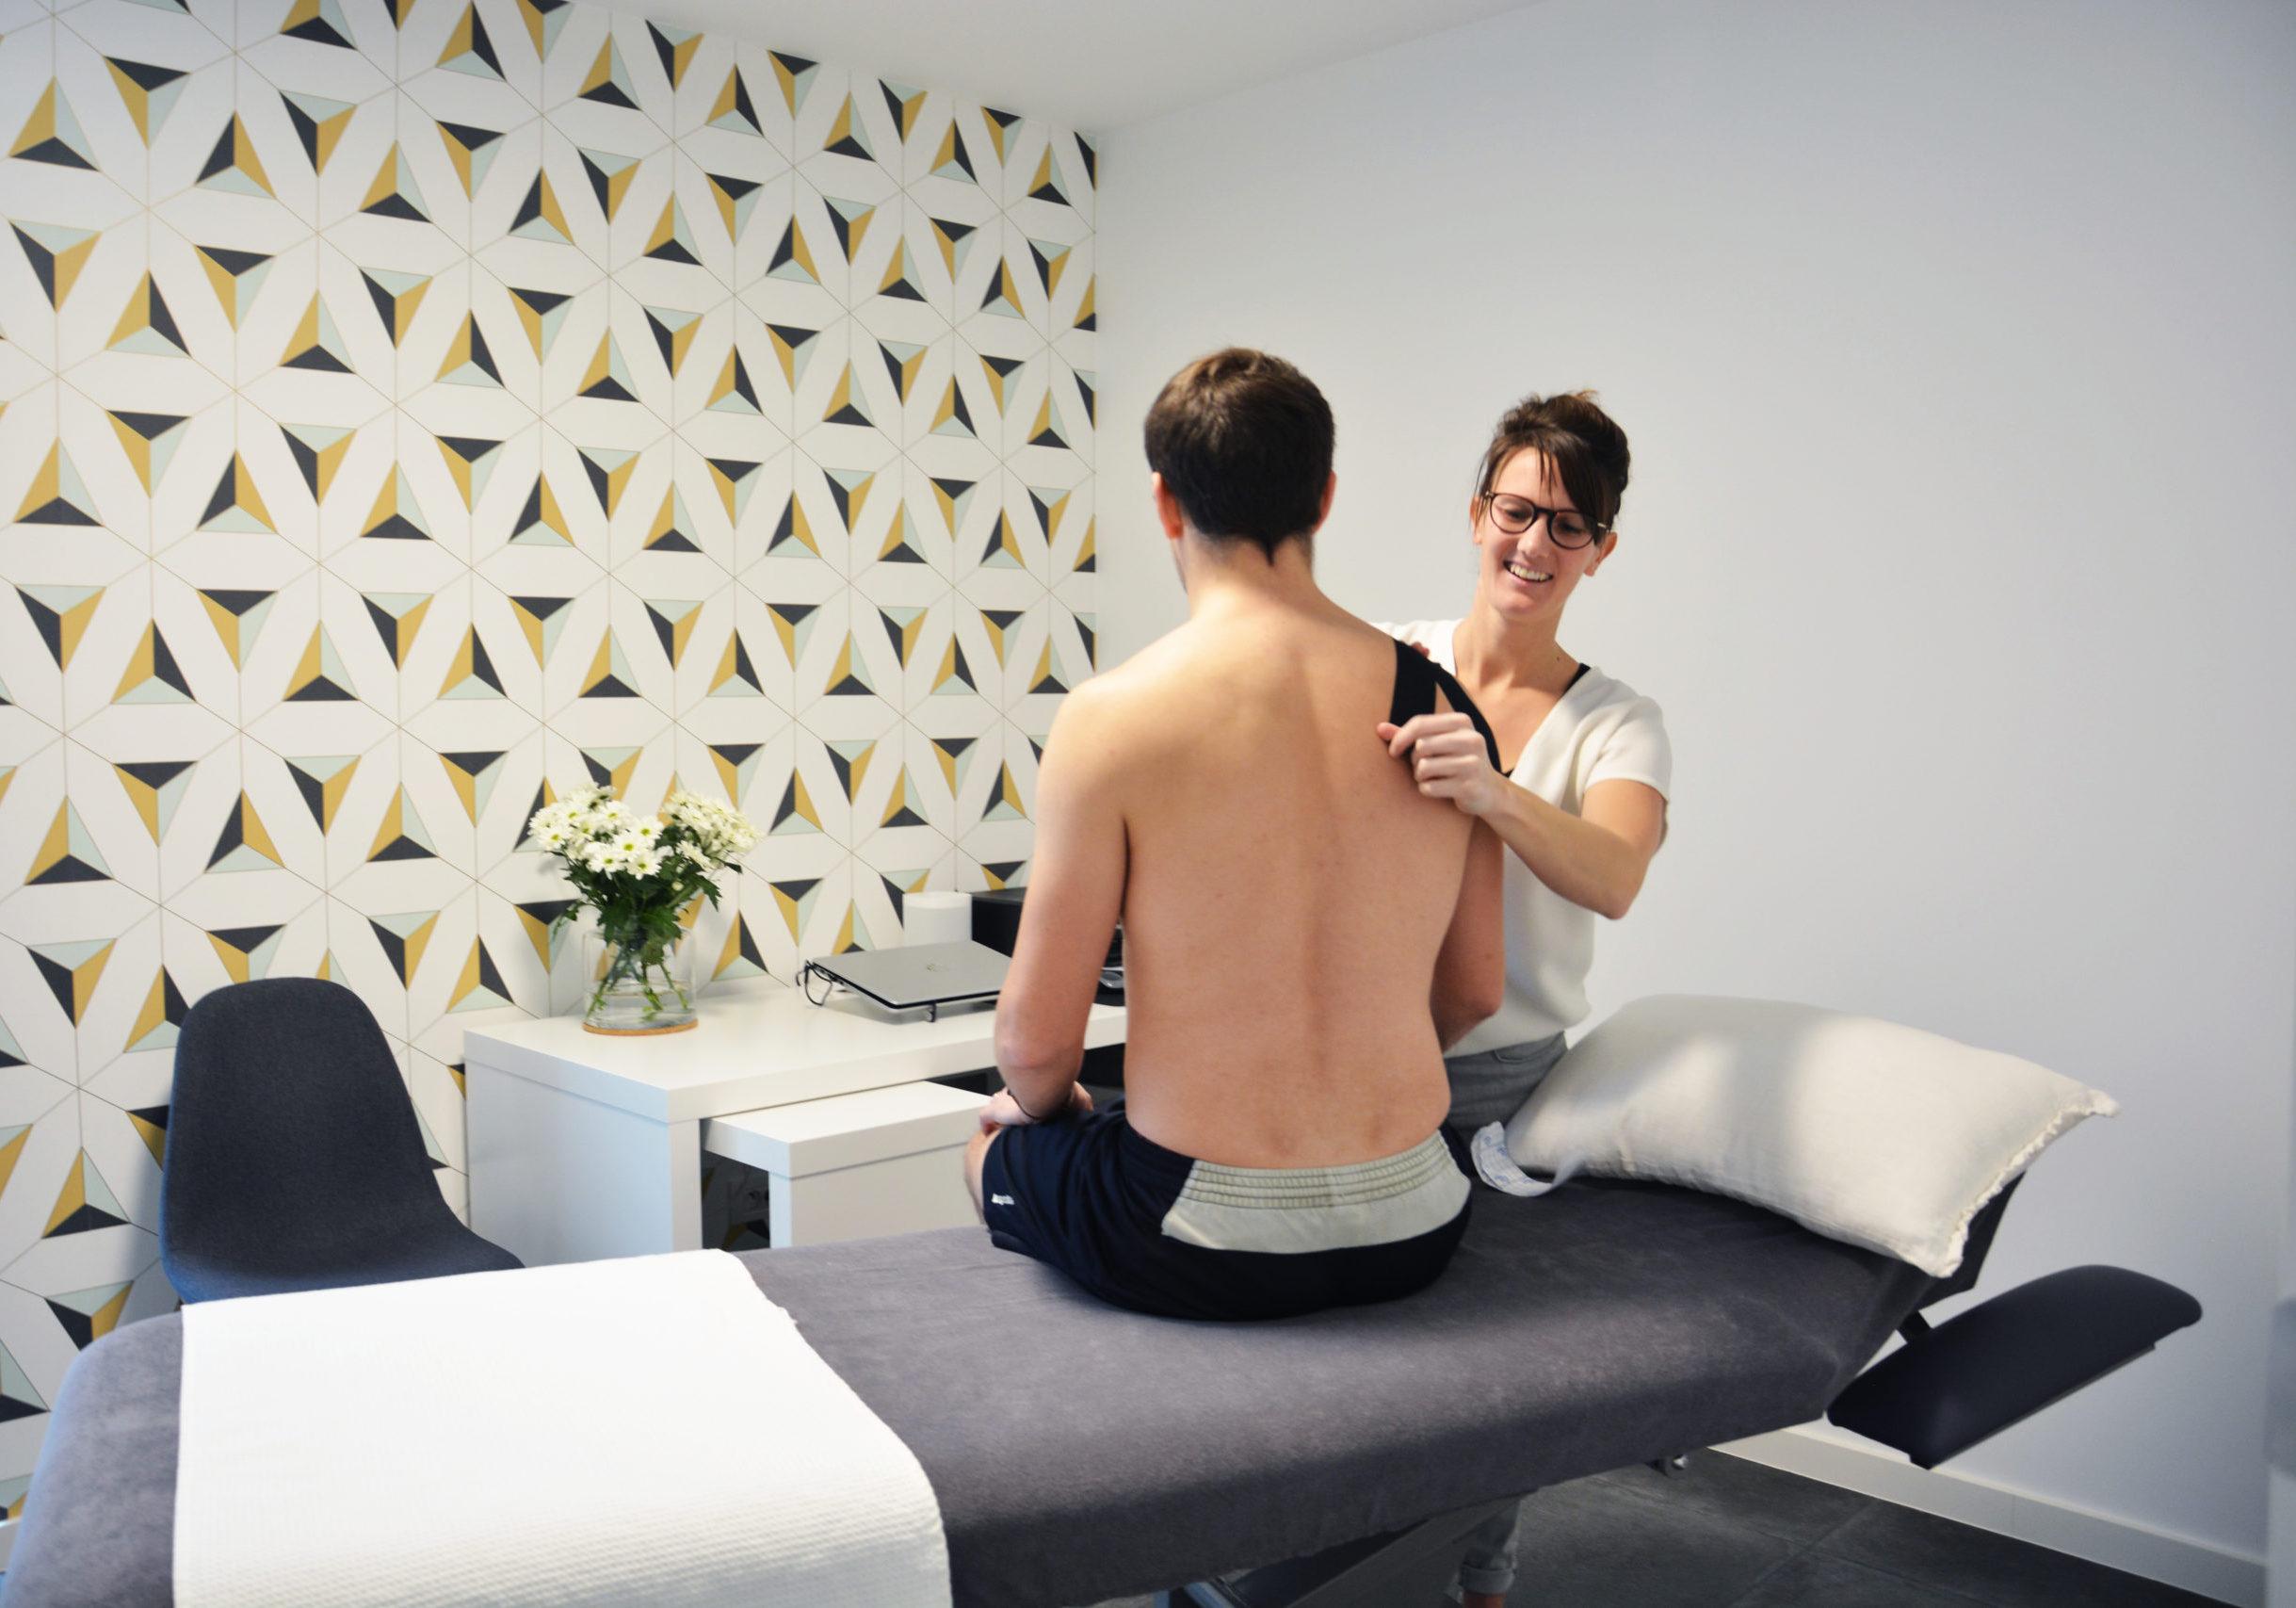 Osteopaat Sien Scheirs behandelt sportblessure in de praktijk te Lint